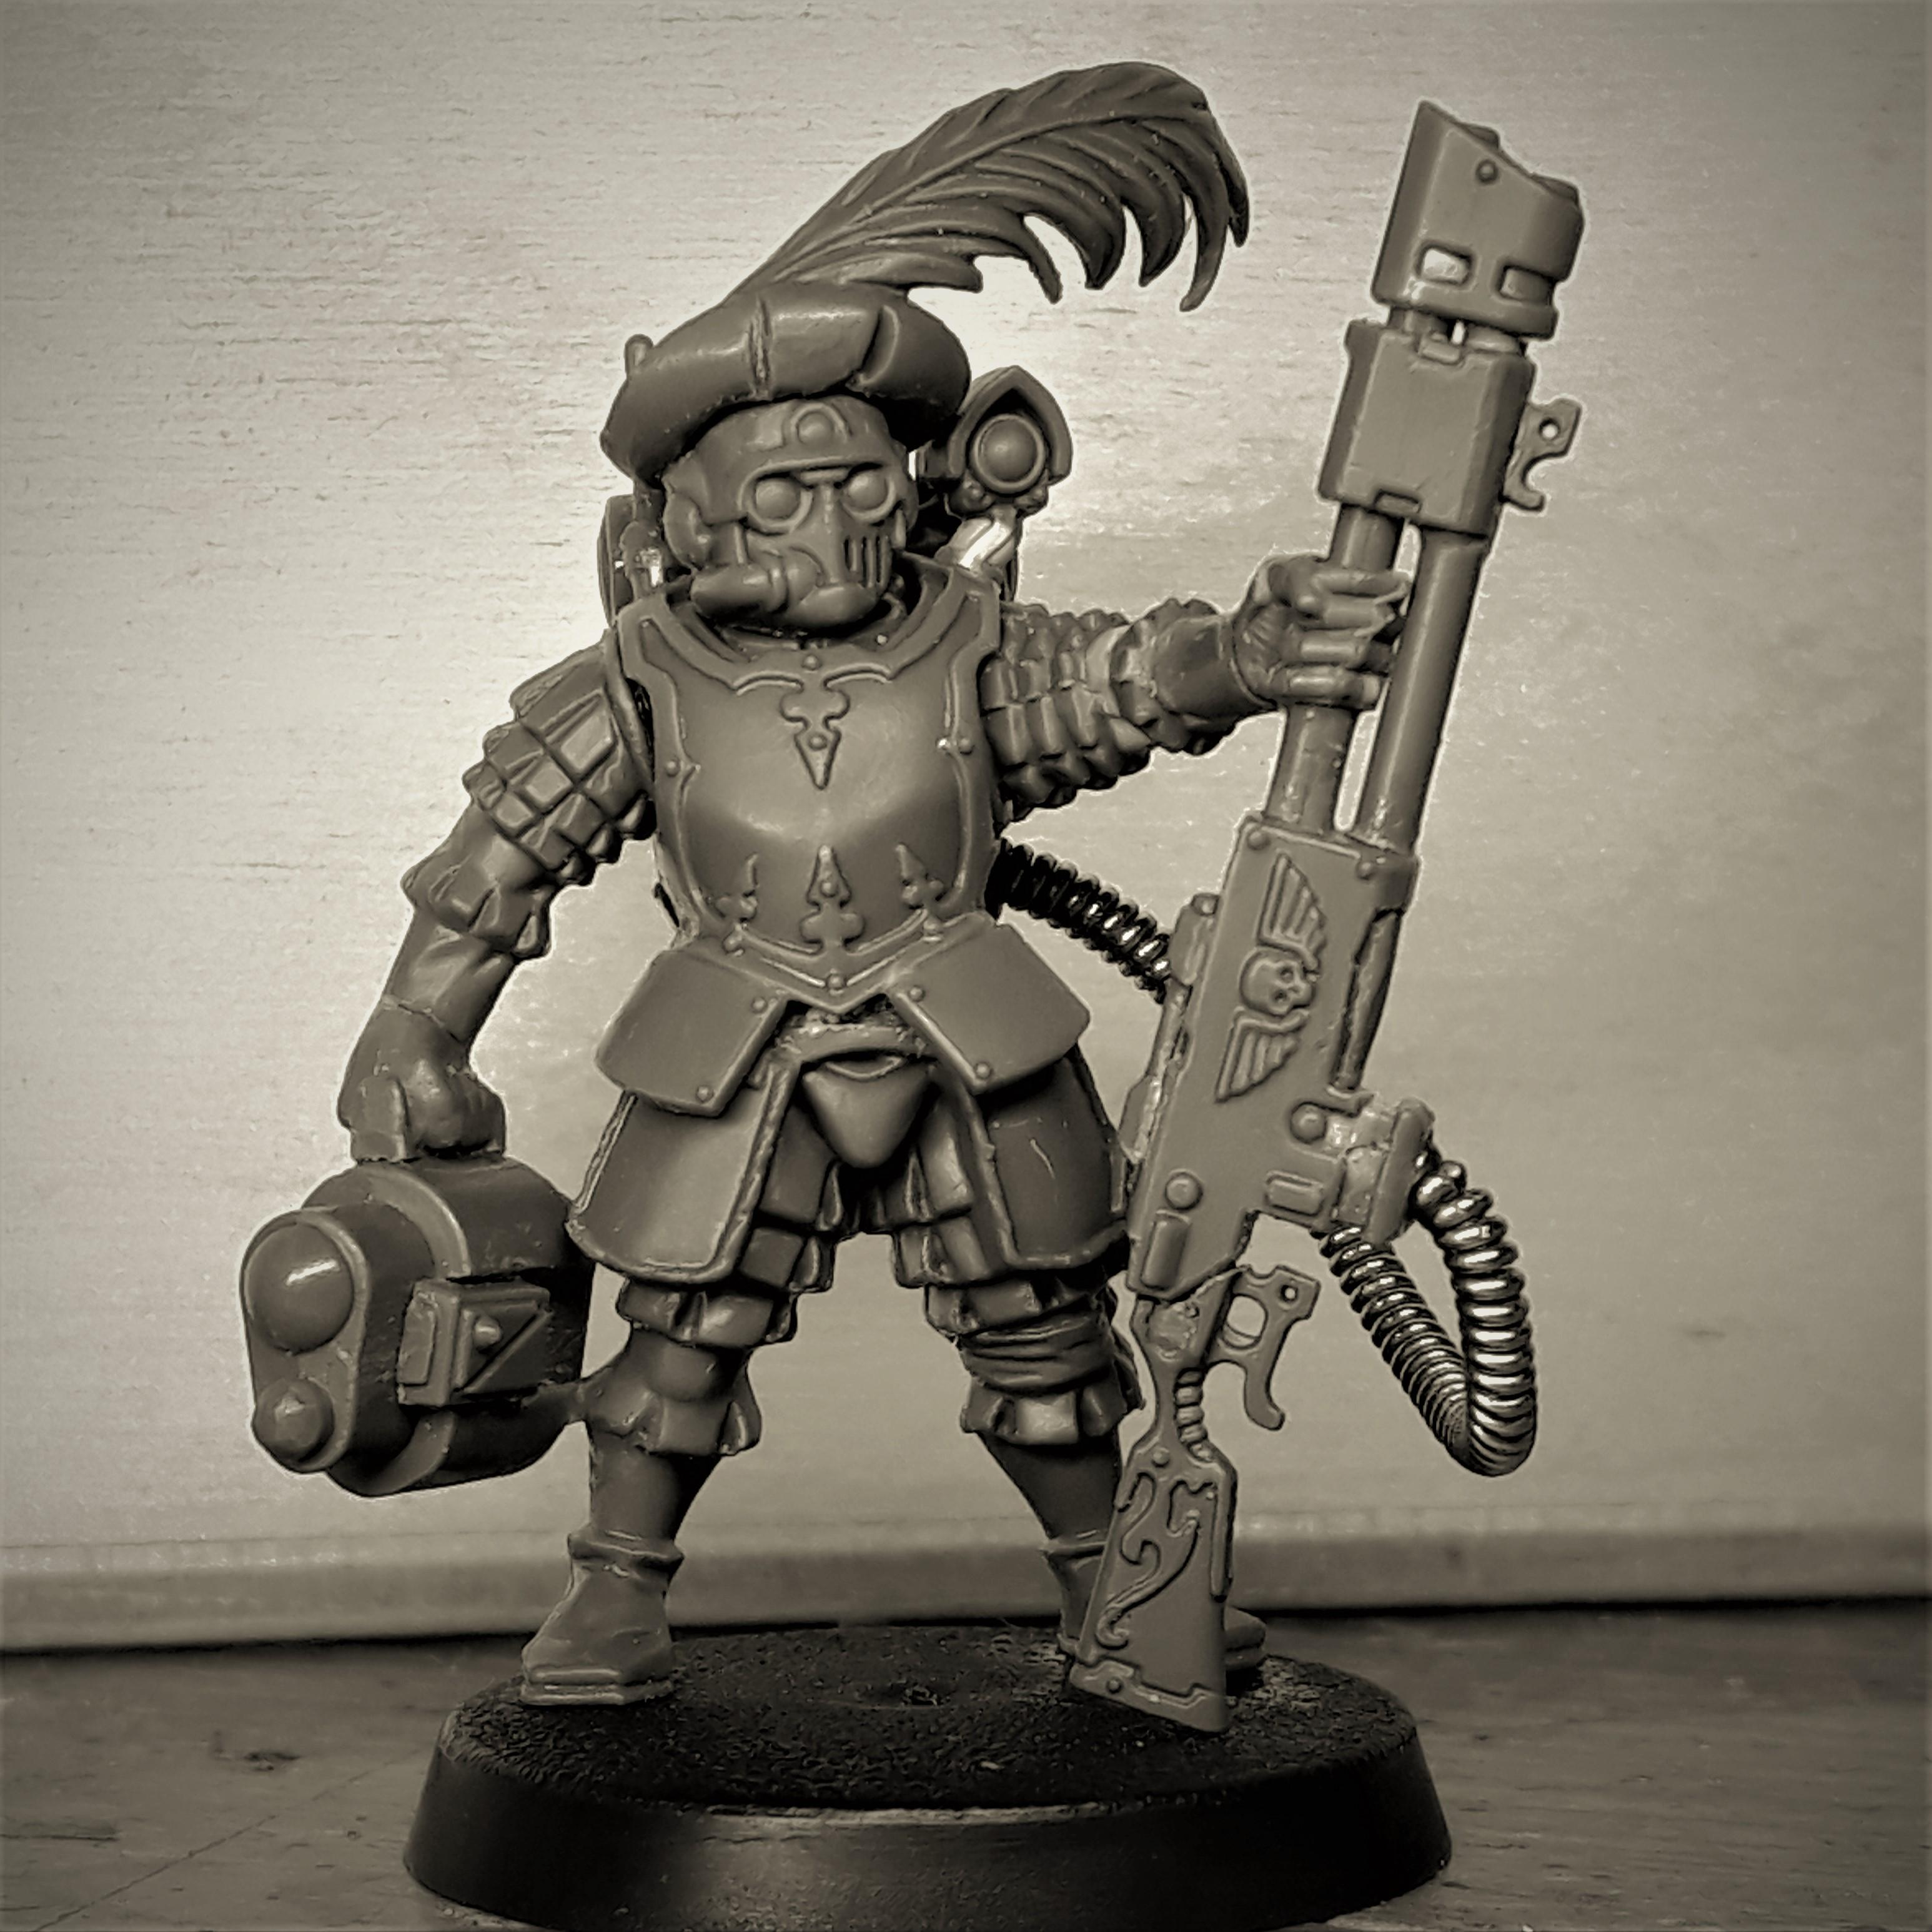 Astra Militarum, Conversion, Hat, Imperial Guard, Kill Team, Kitbash, Scions, Snipers, Warhammer 40,000